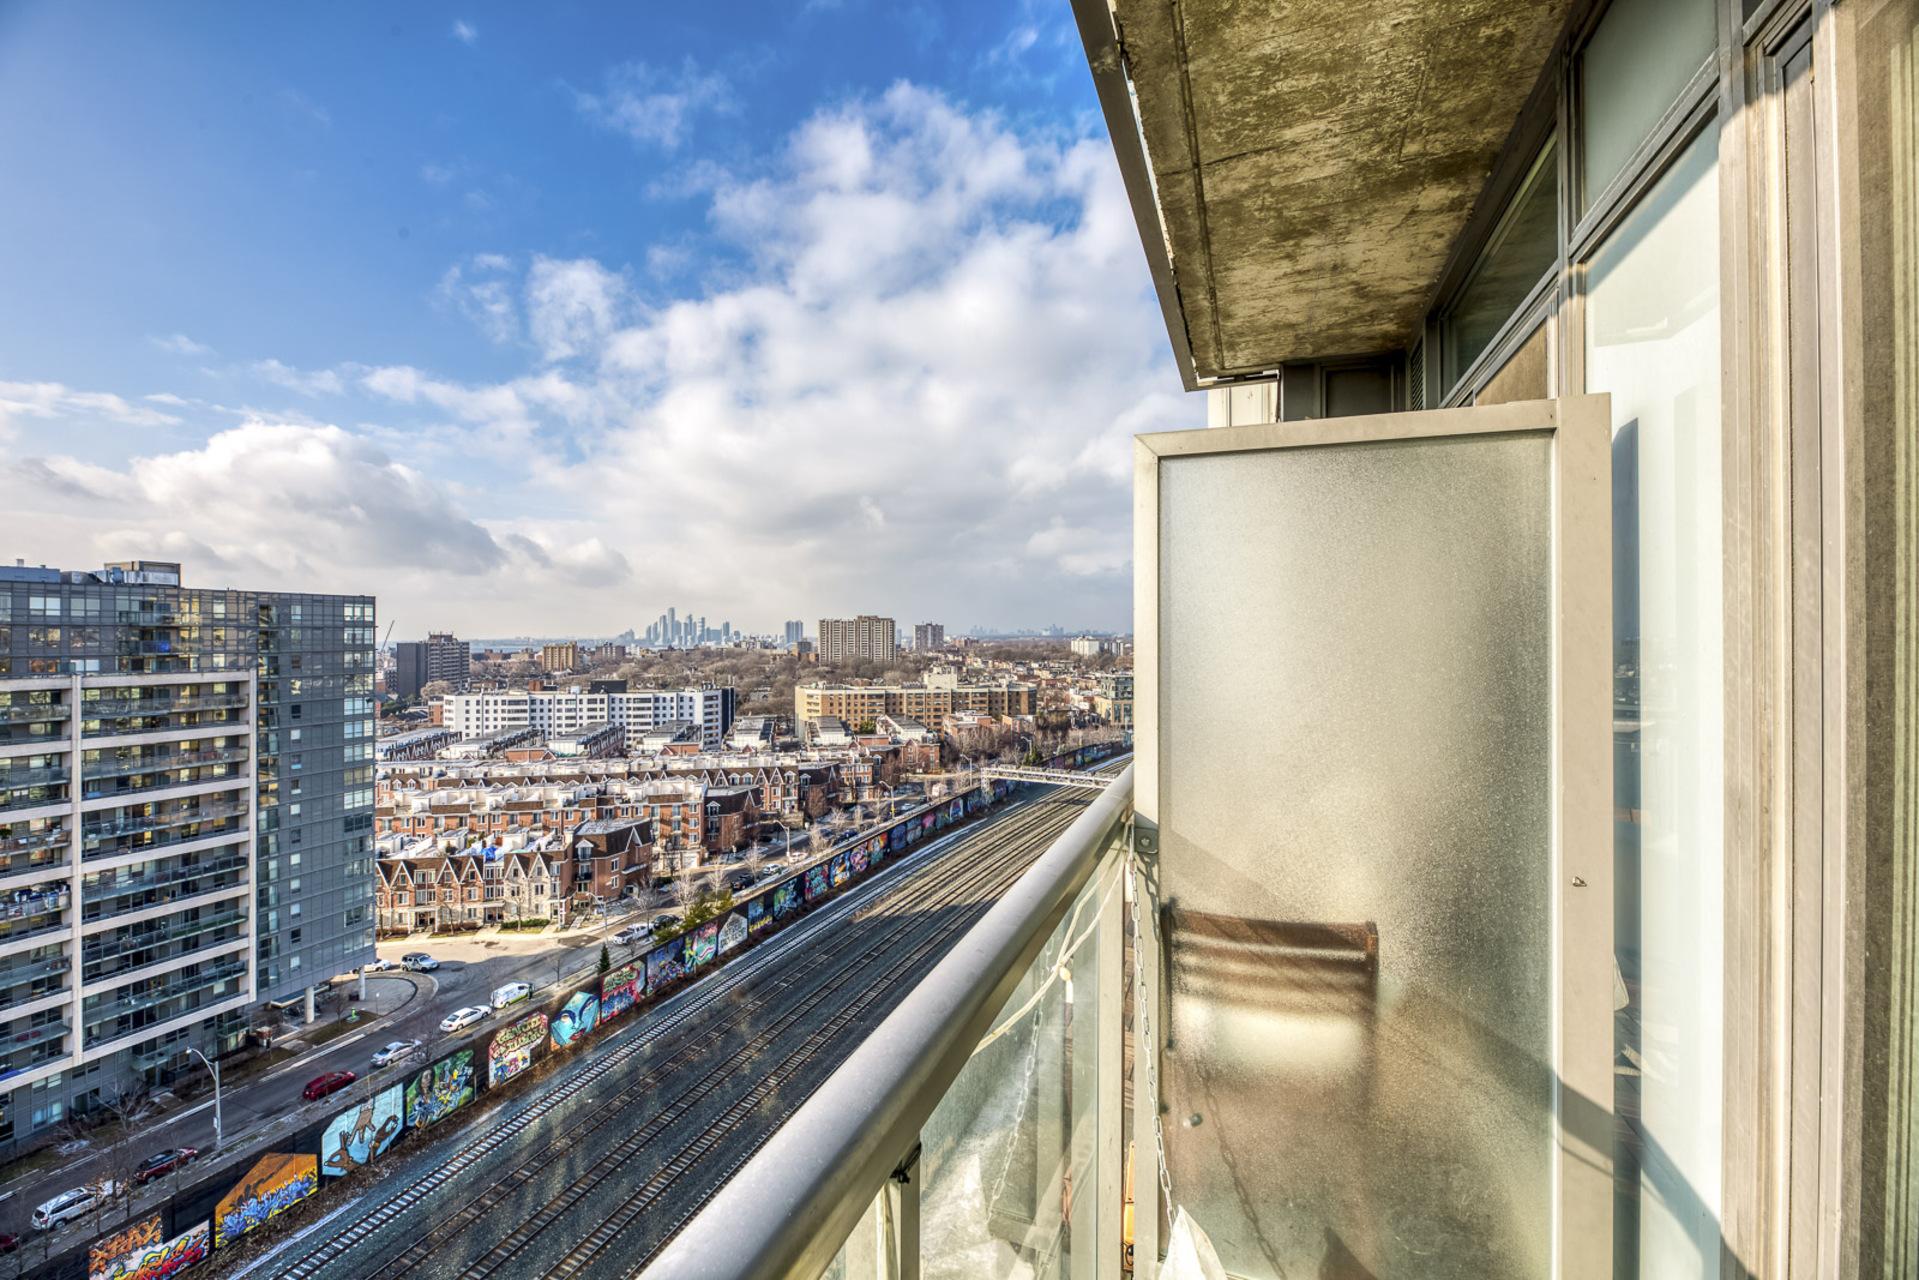 Balcony - 1512-150 Sudbury St, Toronto - Elite3 & Team at 1512 - 150 Sudbury Street, Little Portugal, Toronto